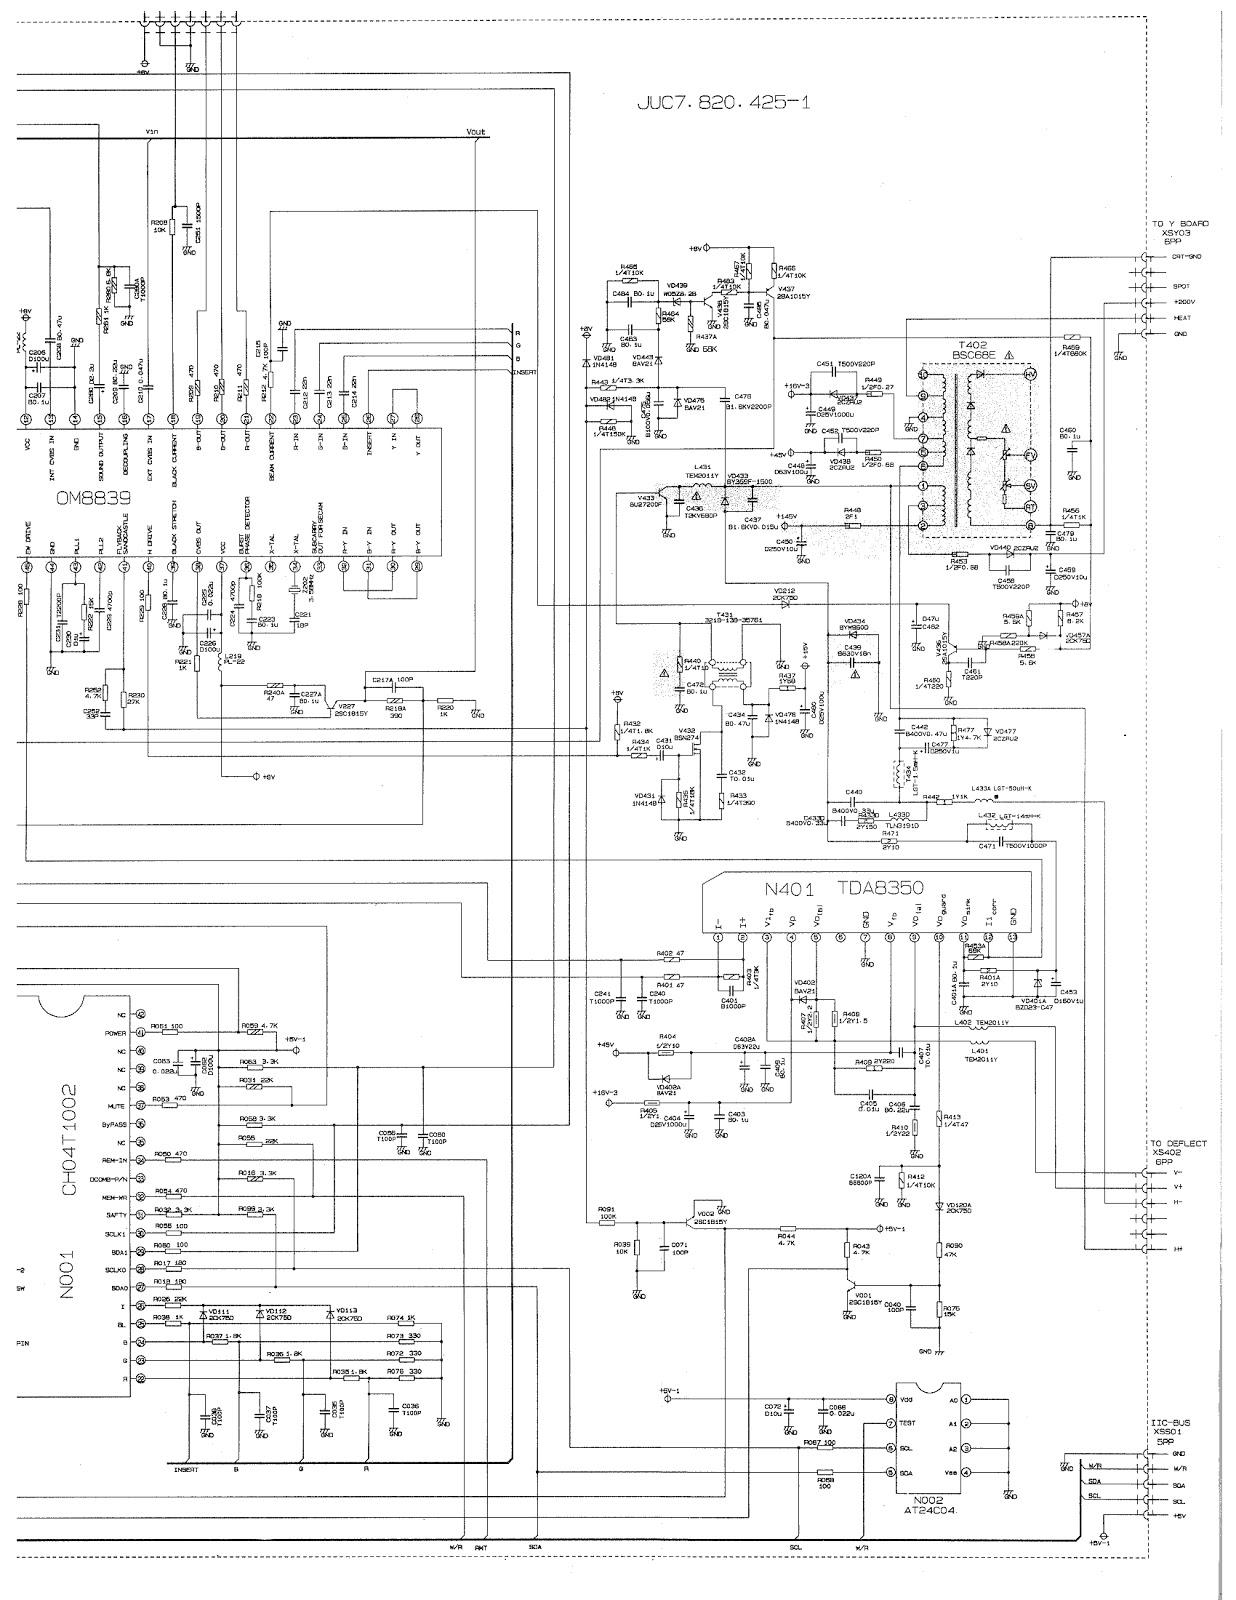 philips tv power supply diagram